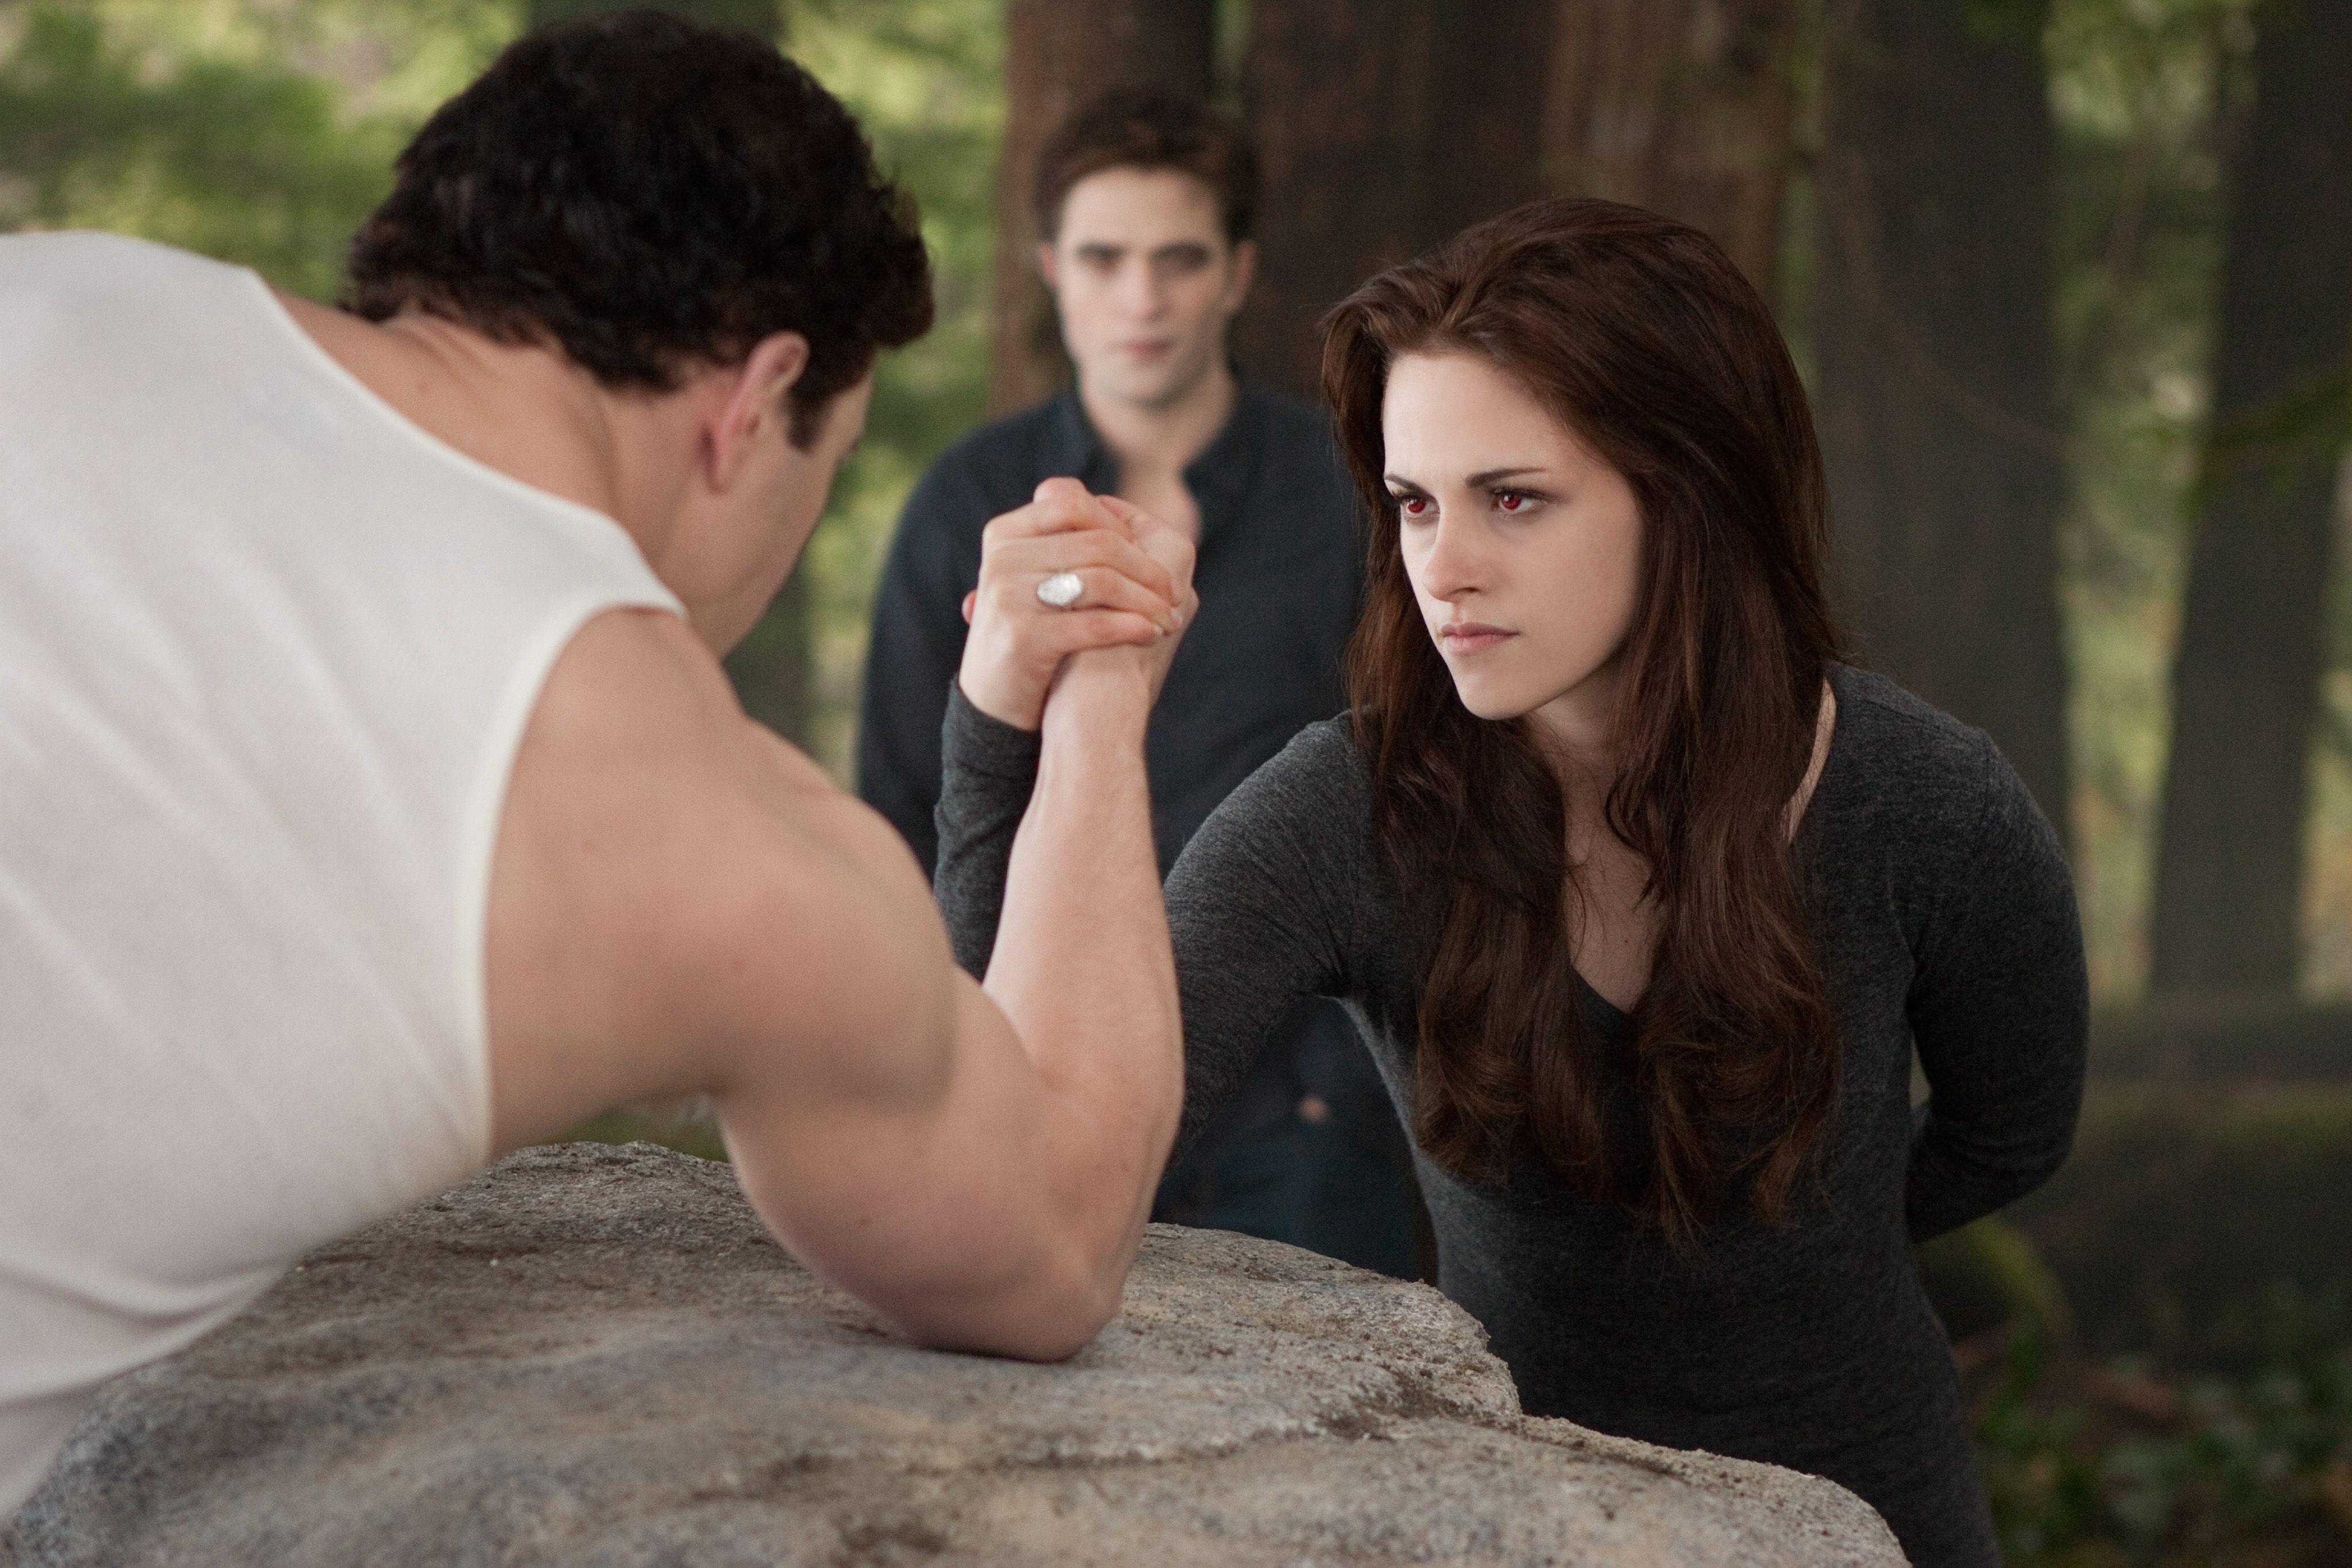 THE TWILIGHT SAGA: BREAKING DAWN – PART 2 Review. The Film ... Vampire Twilight 5